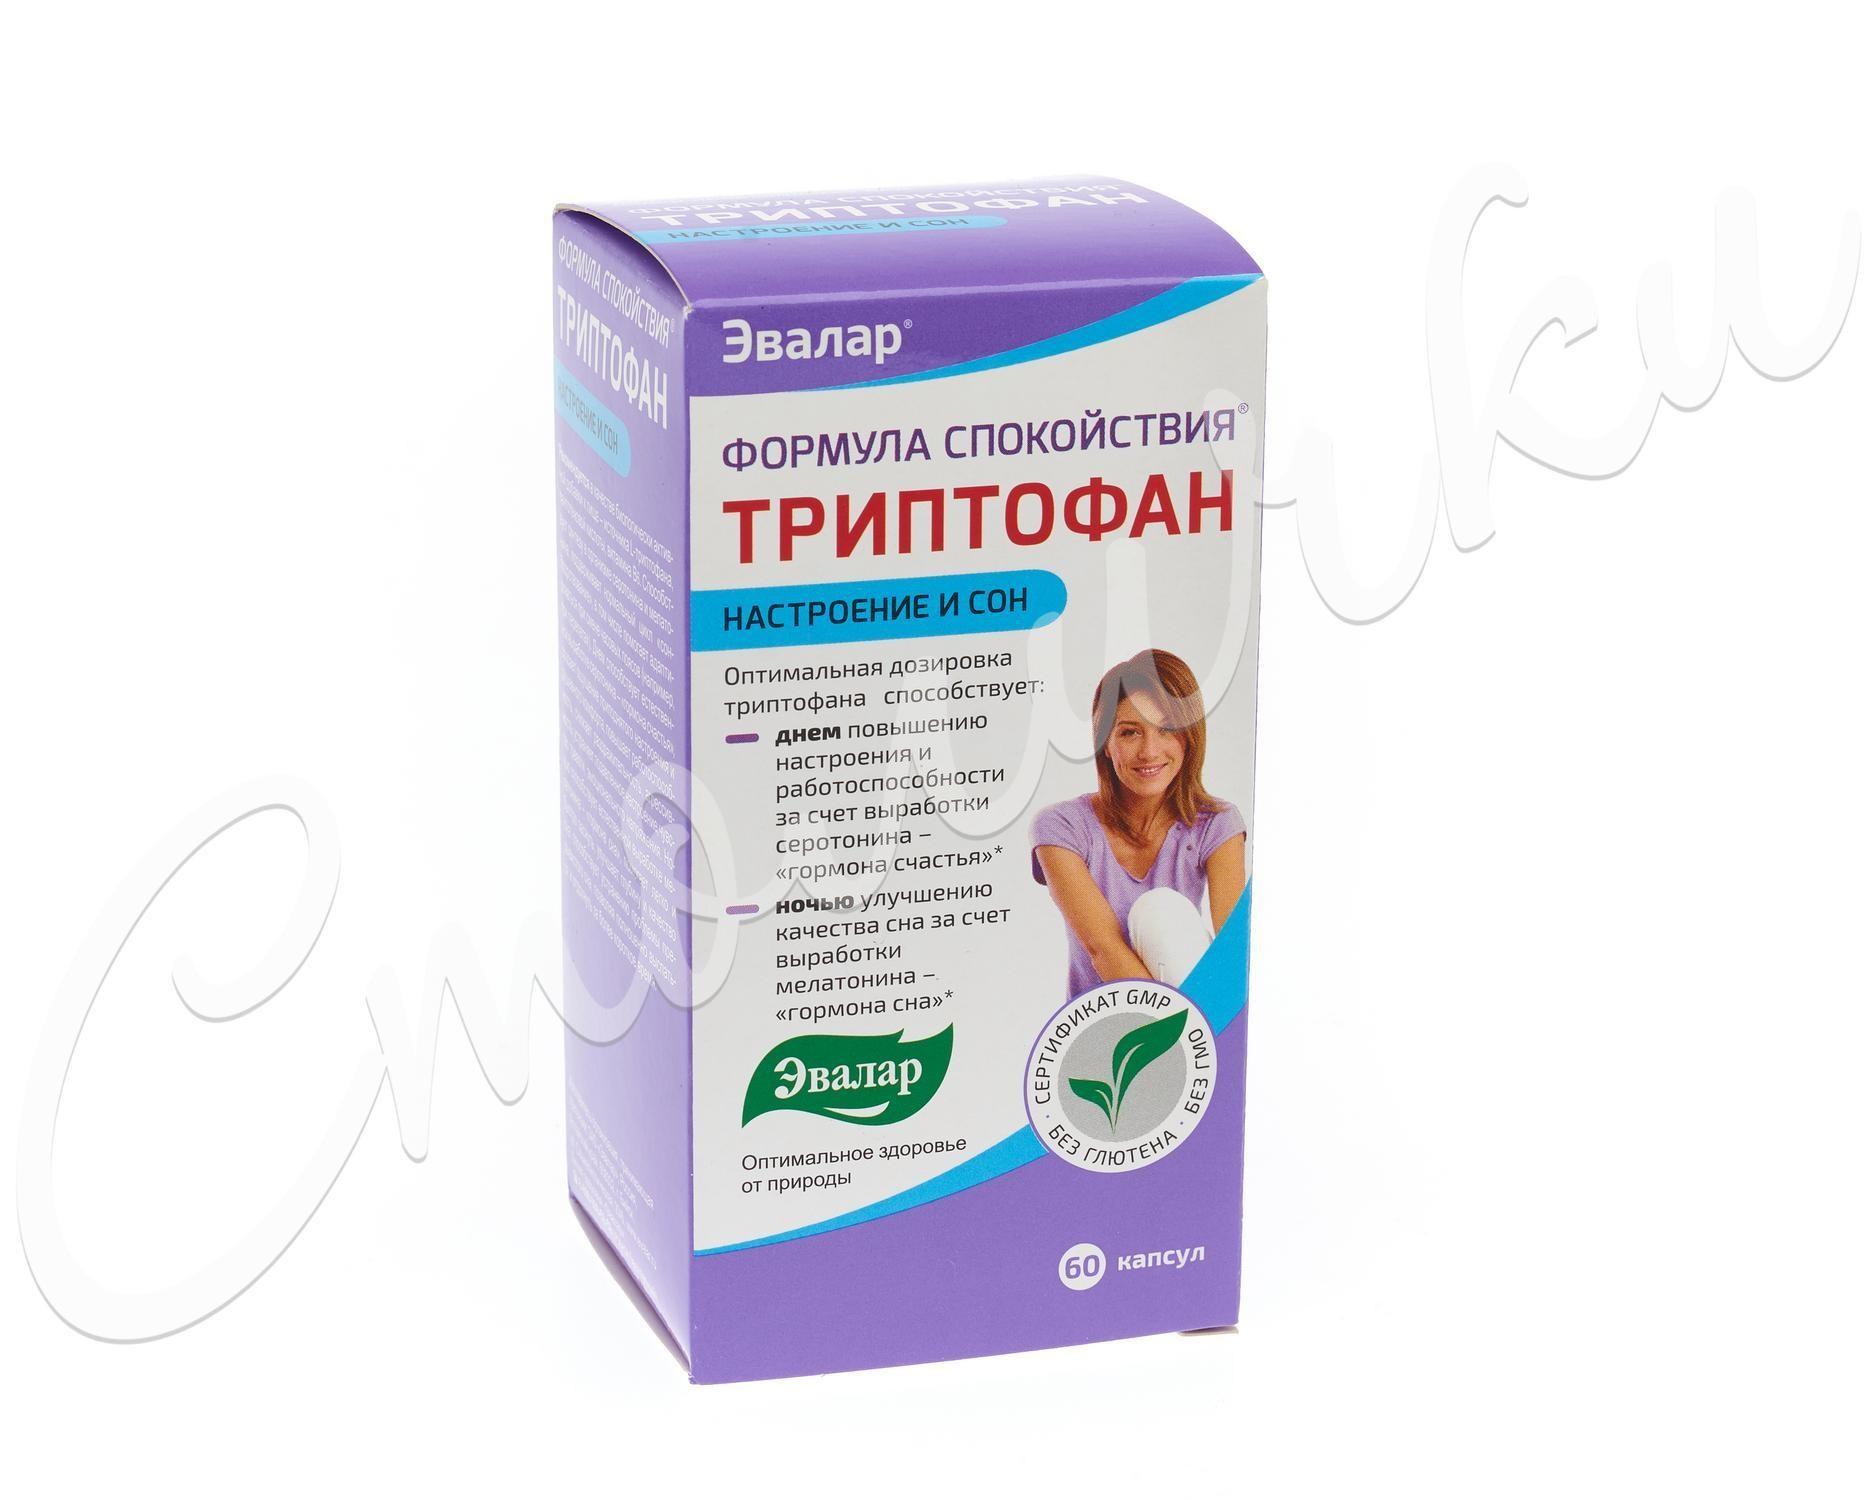 Применение триптофана. цены на l-триптофан. отзывы